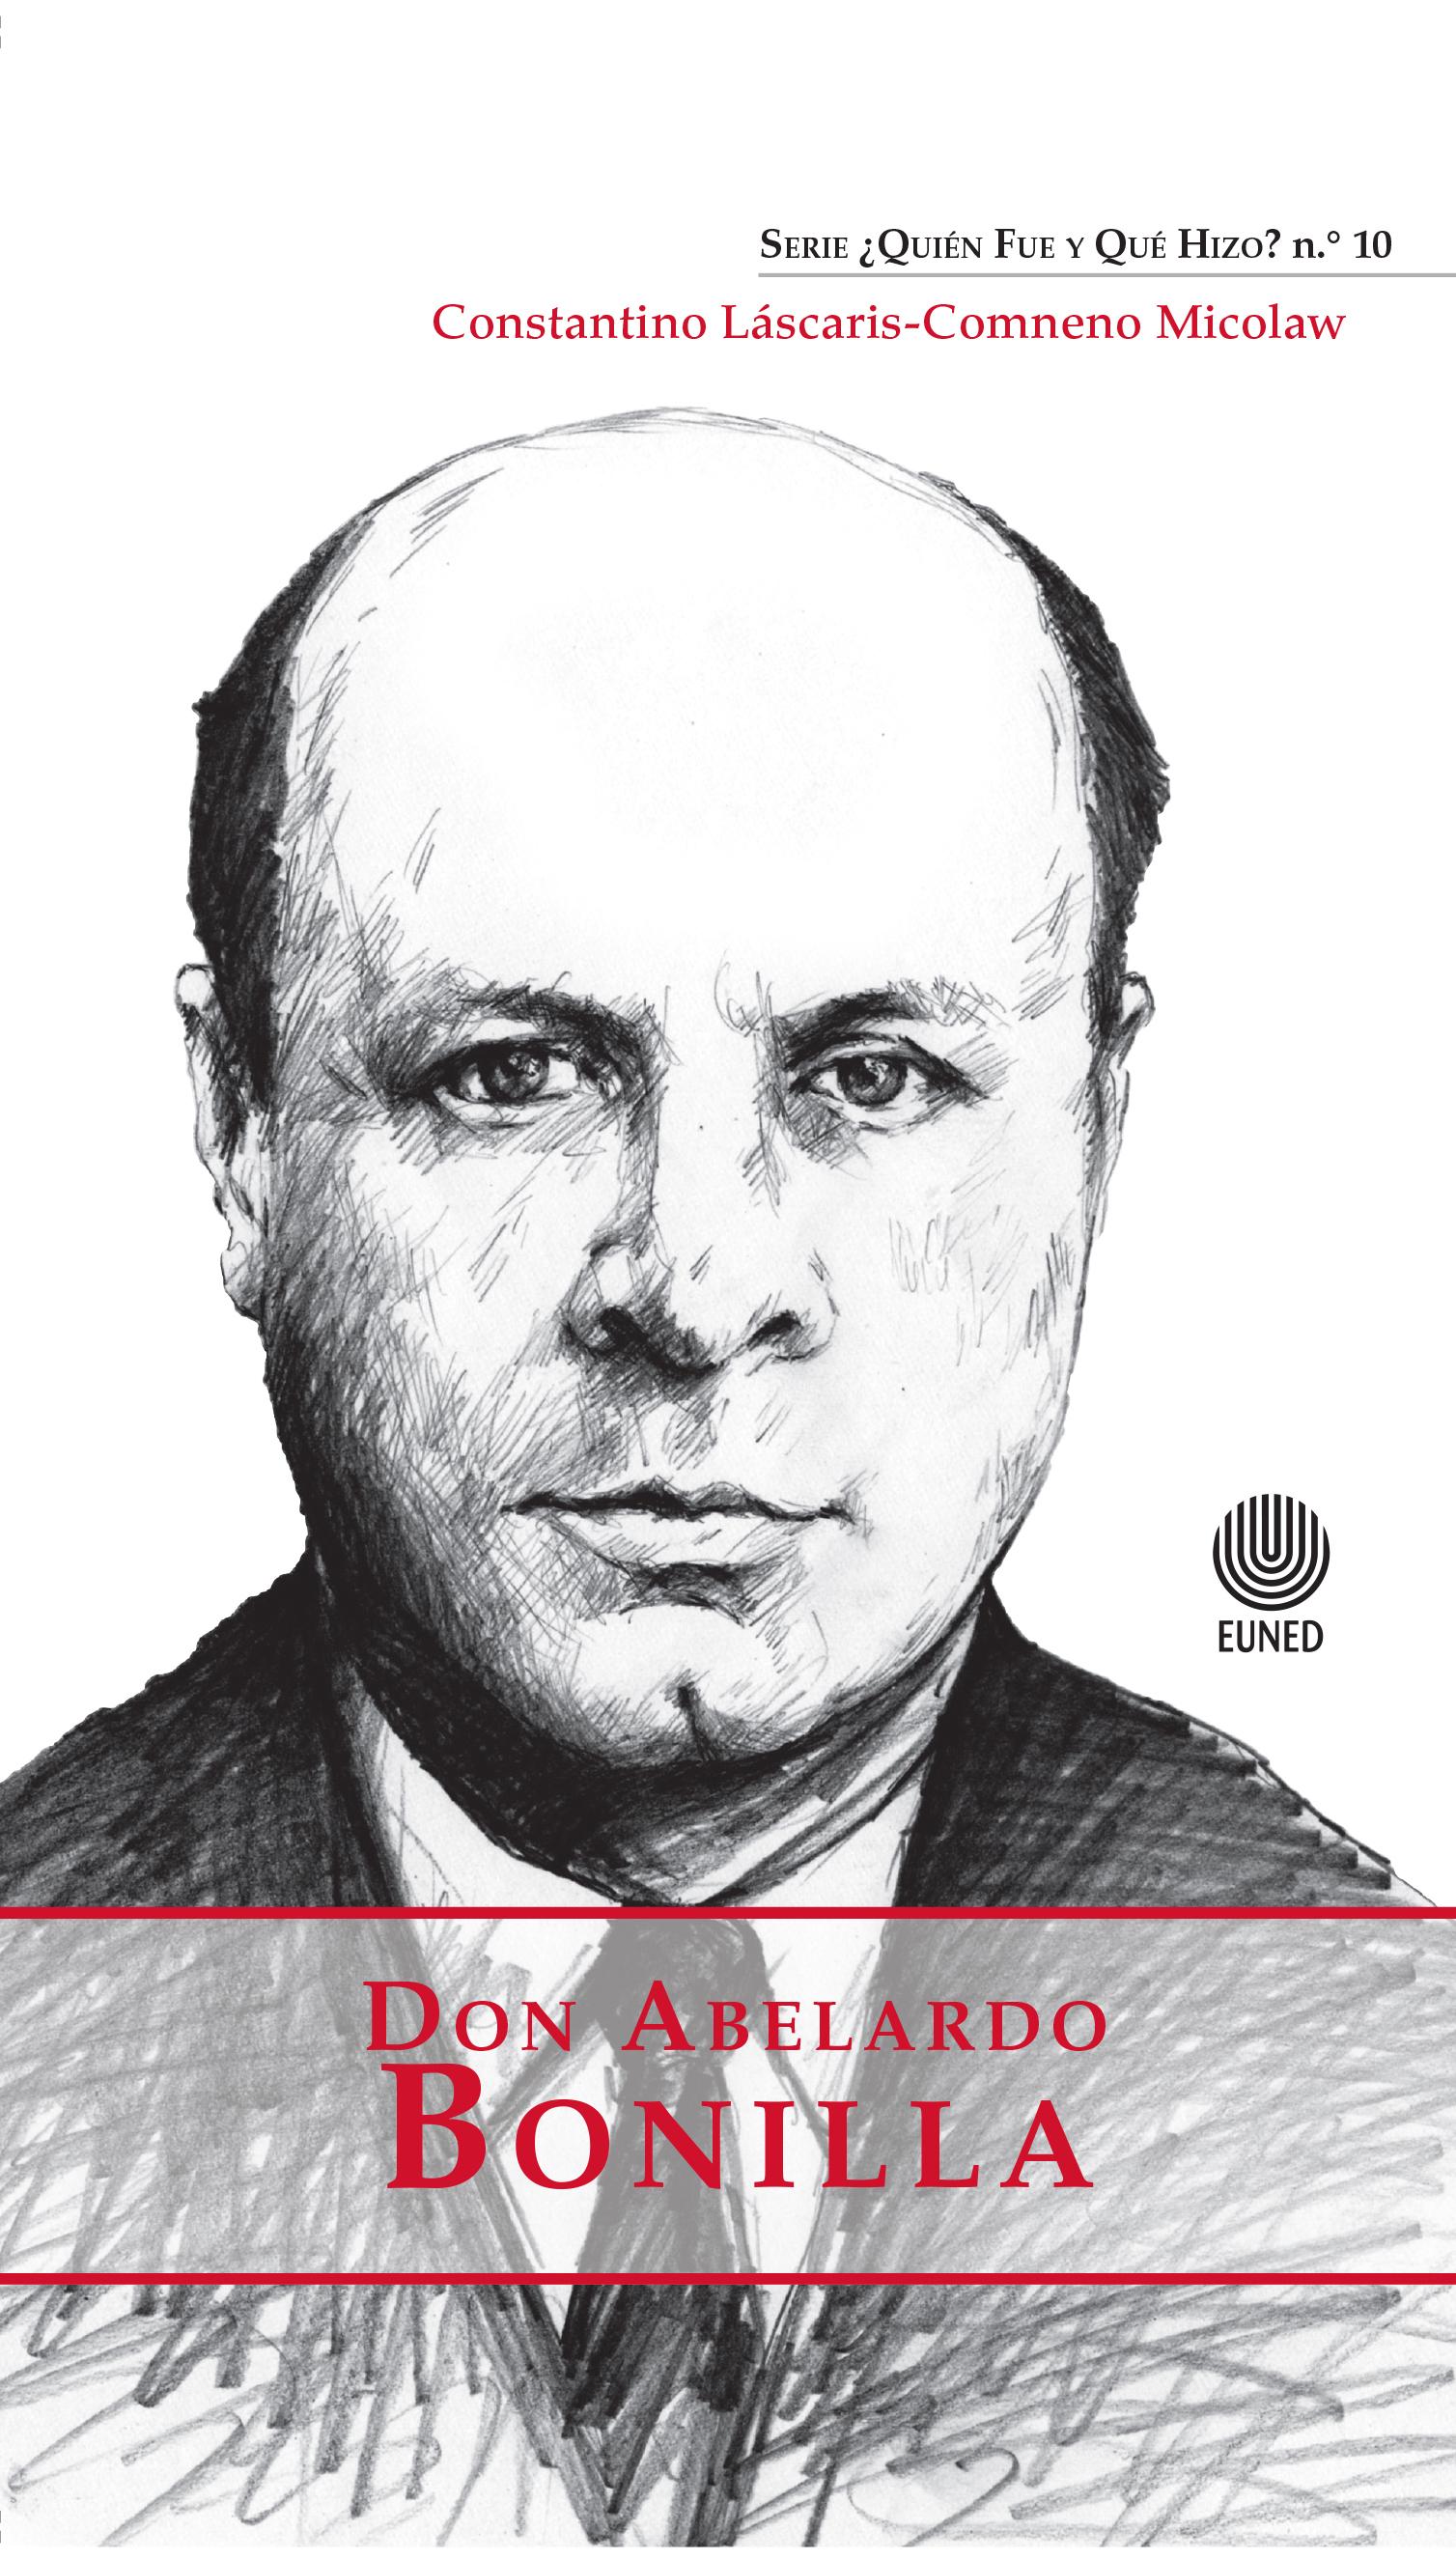 Don Abelardo Bonilla